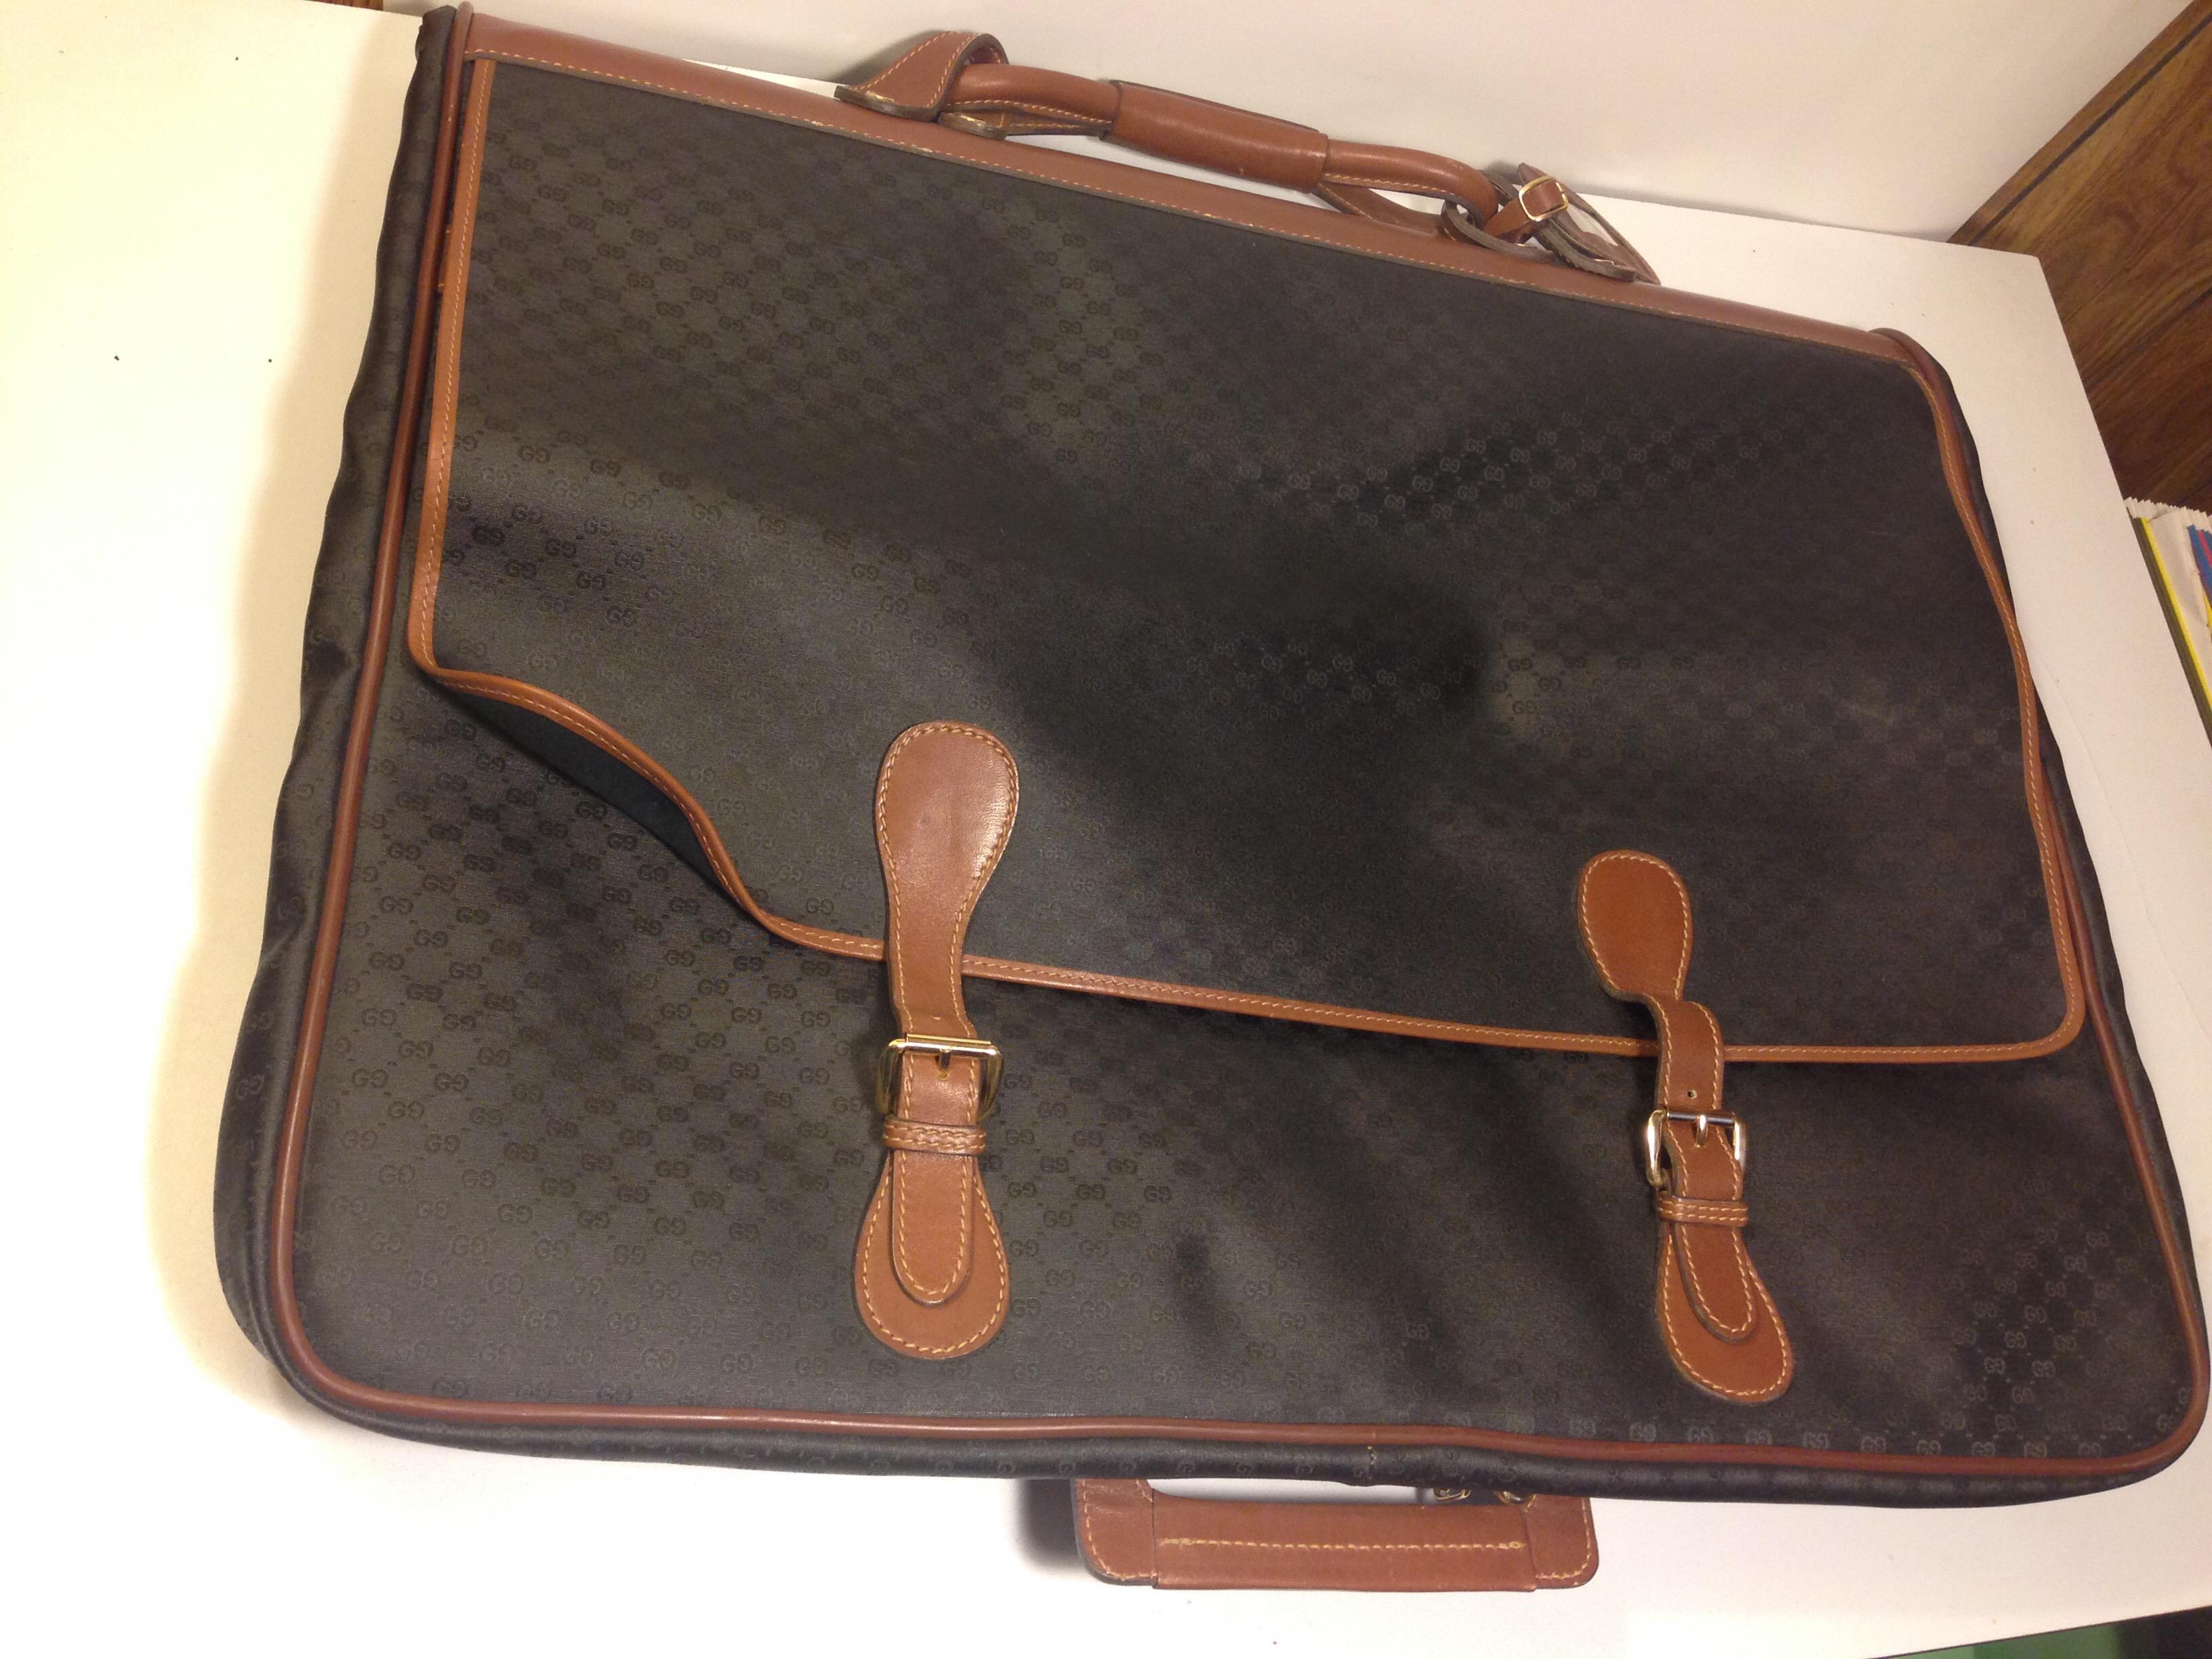 a937a22a7cdf Gucci Vintage Monogram Garment Travel Bag on Storenvy